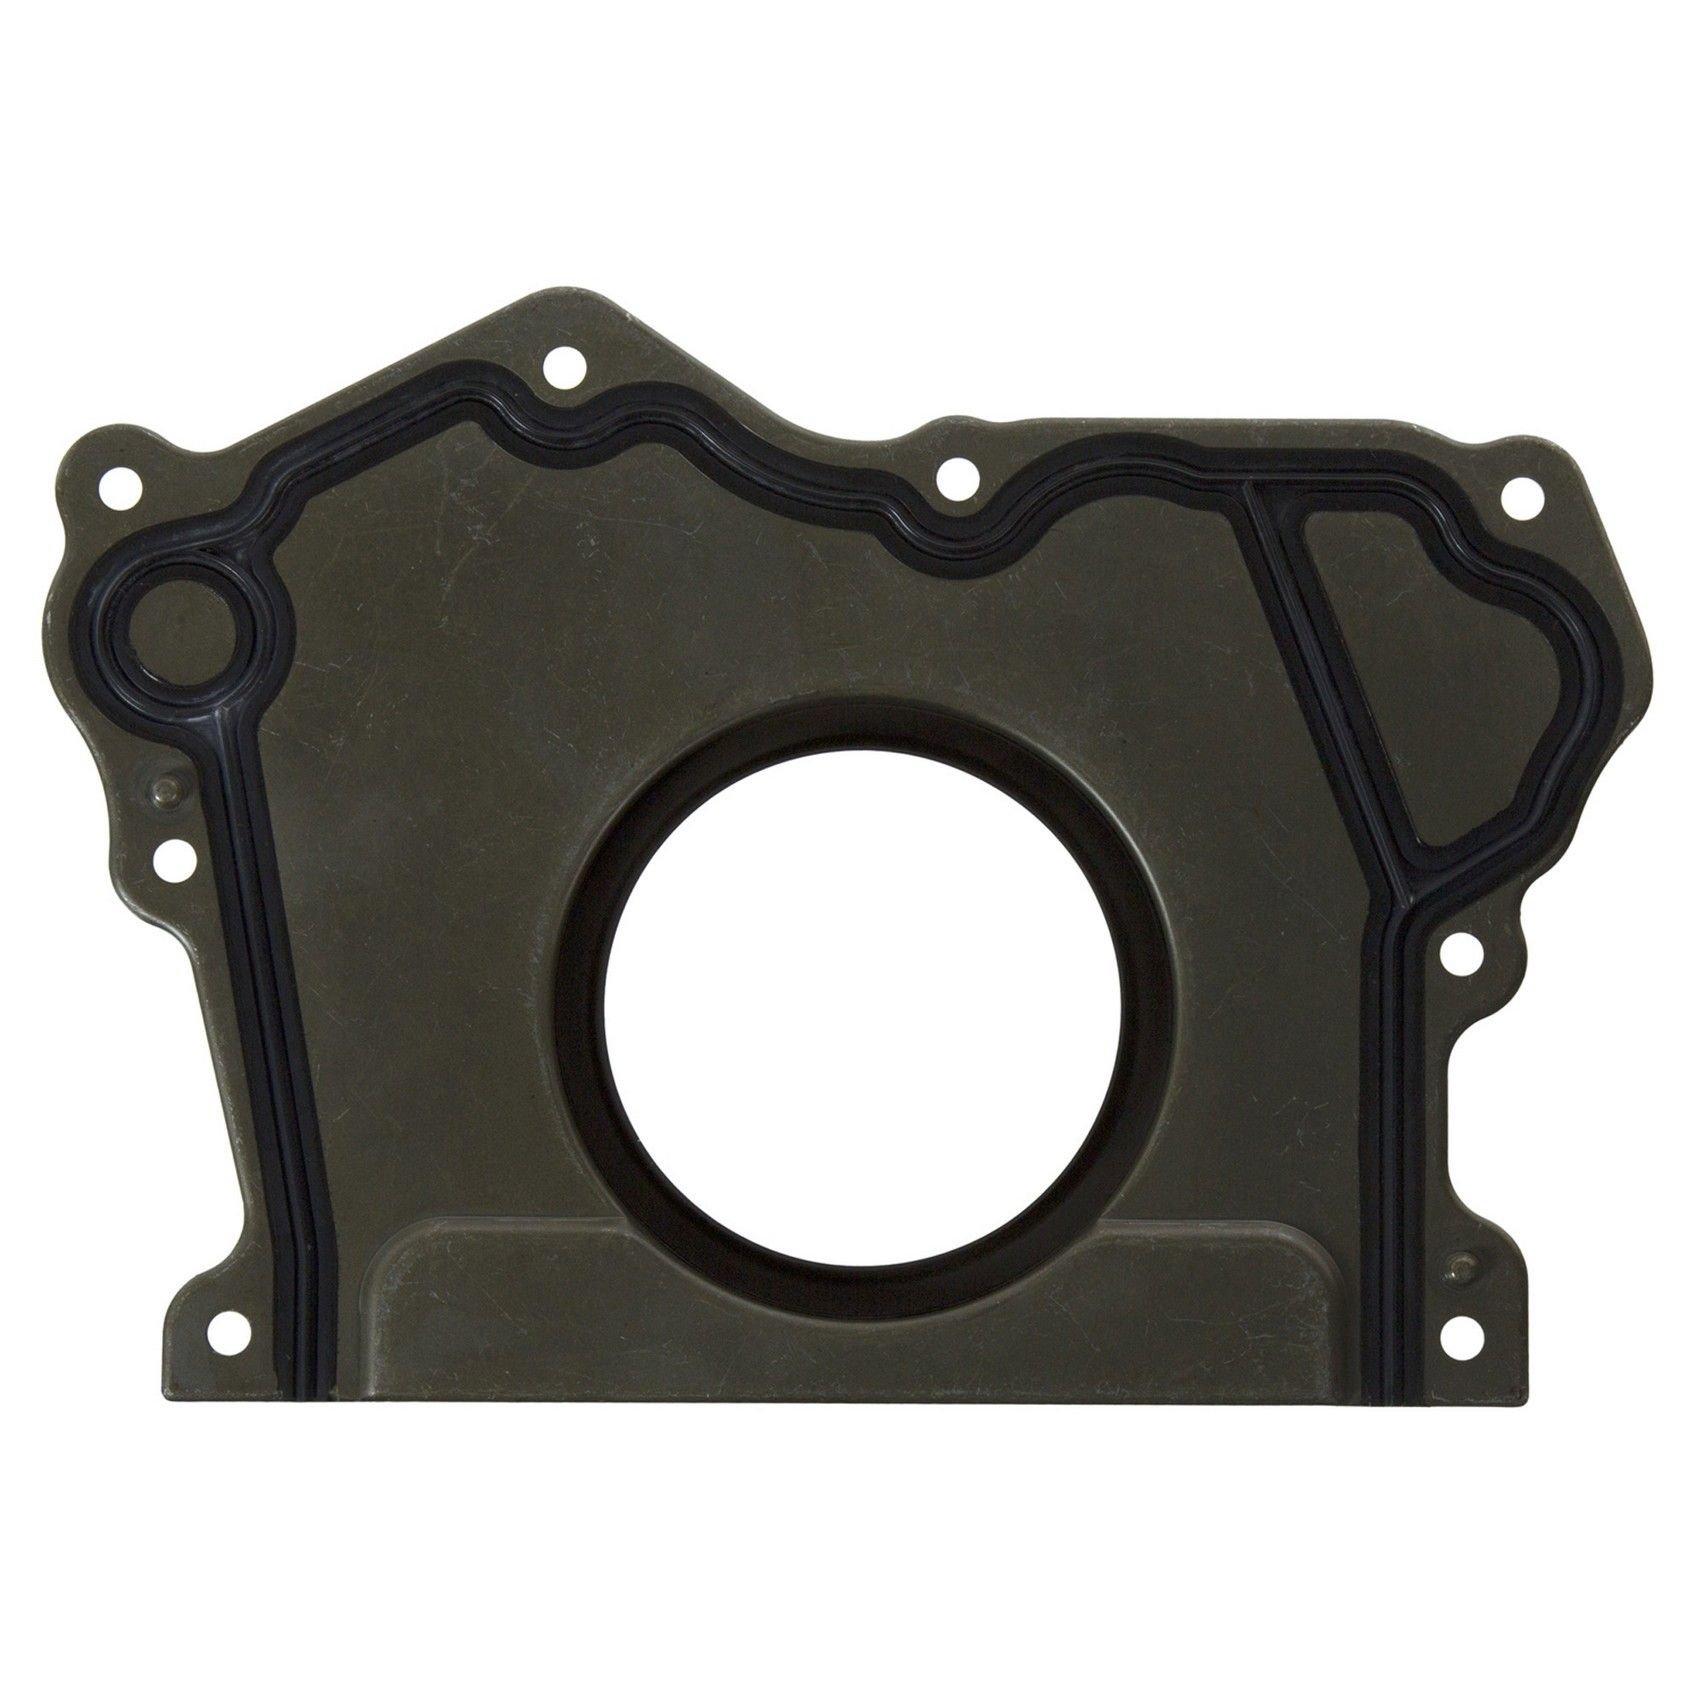 Dodge Charger Engine Crankshaft Seal Kit Replacement (FelPro) » Go-Parts